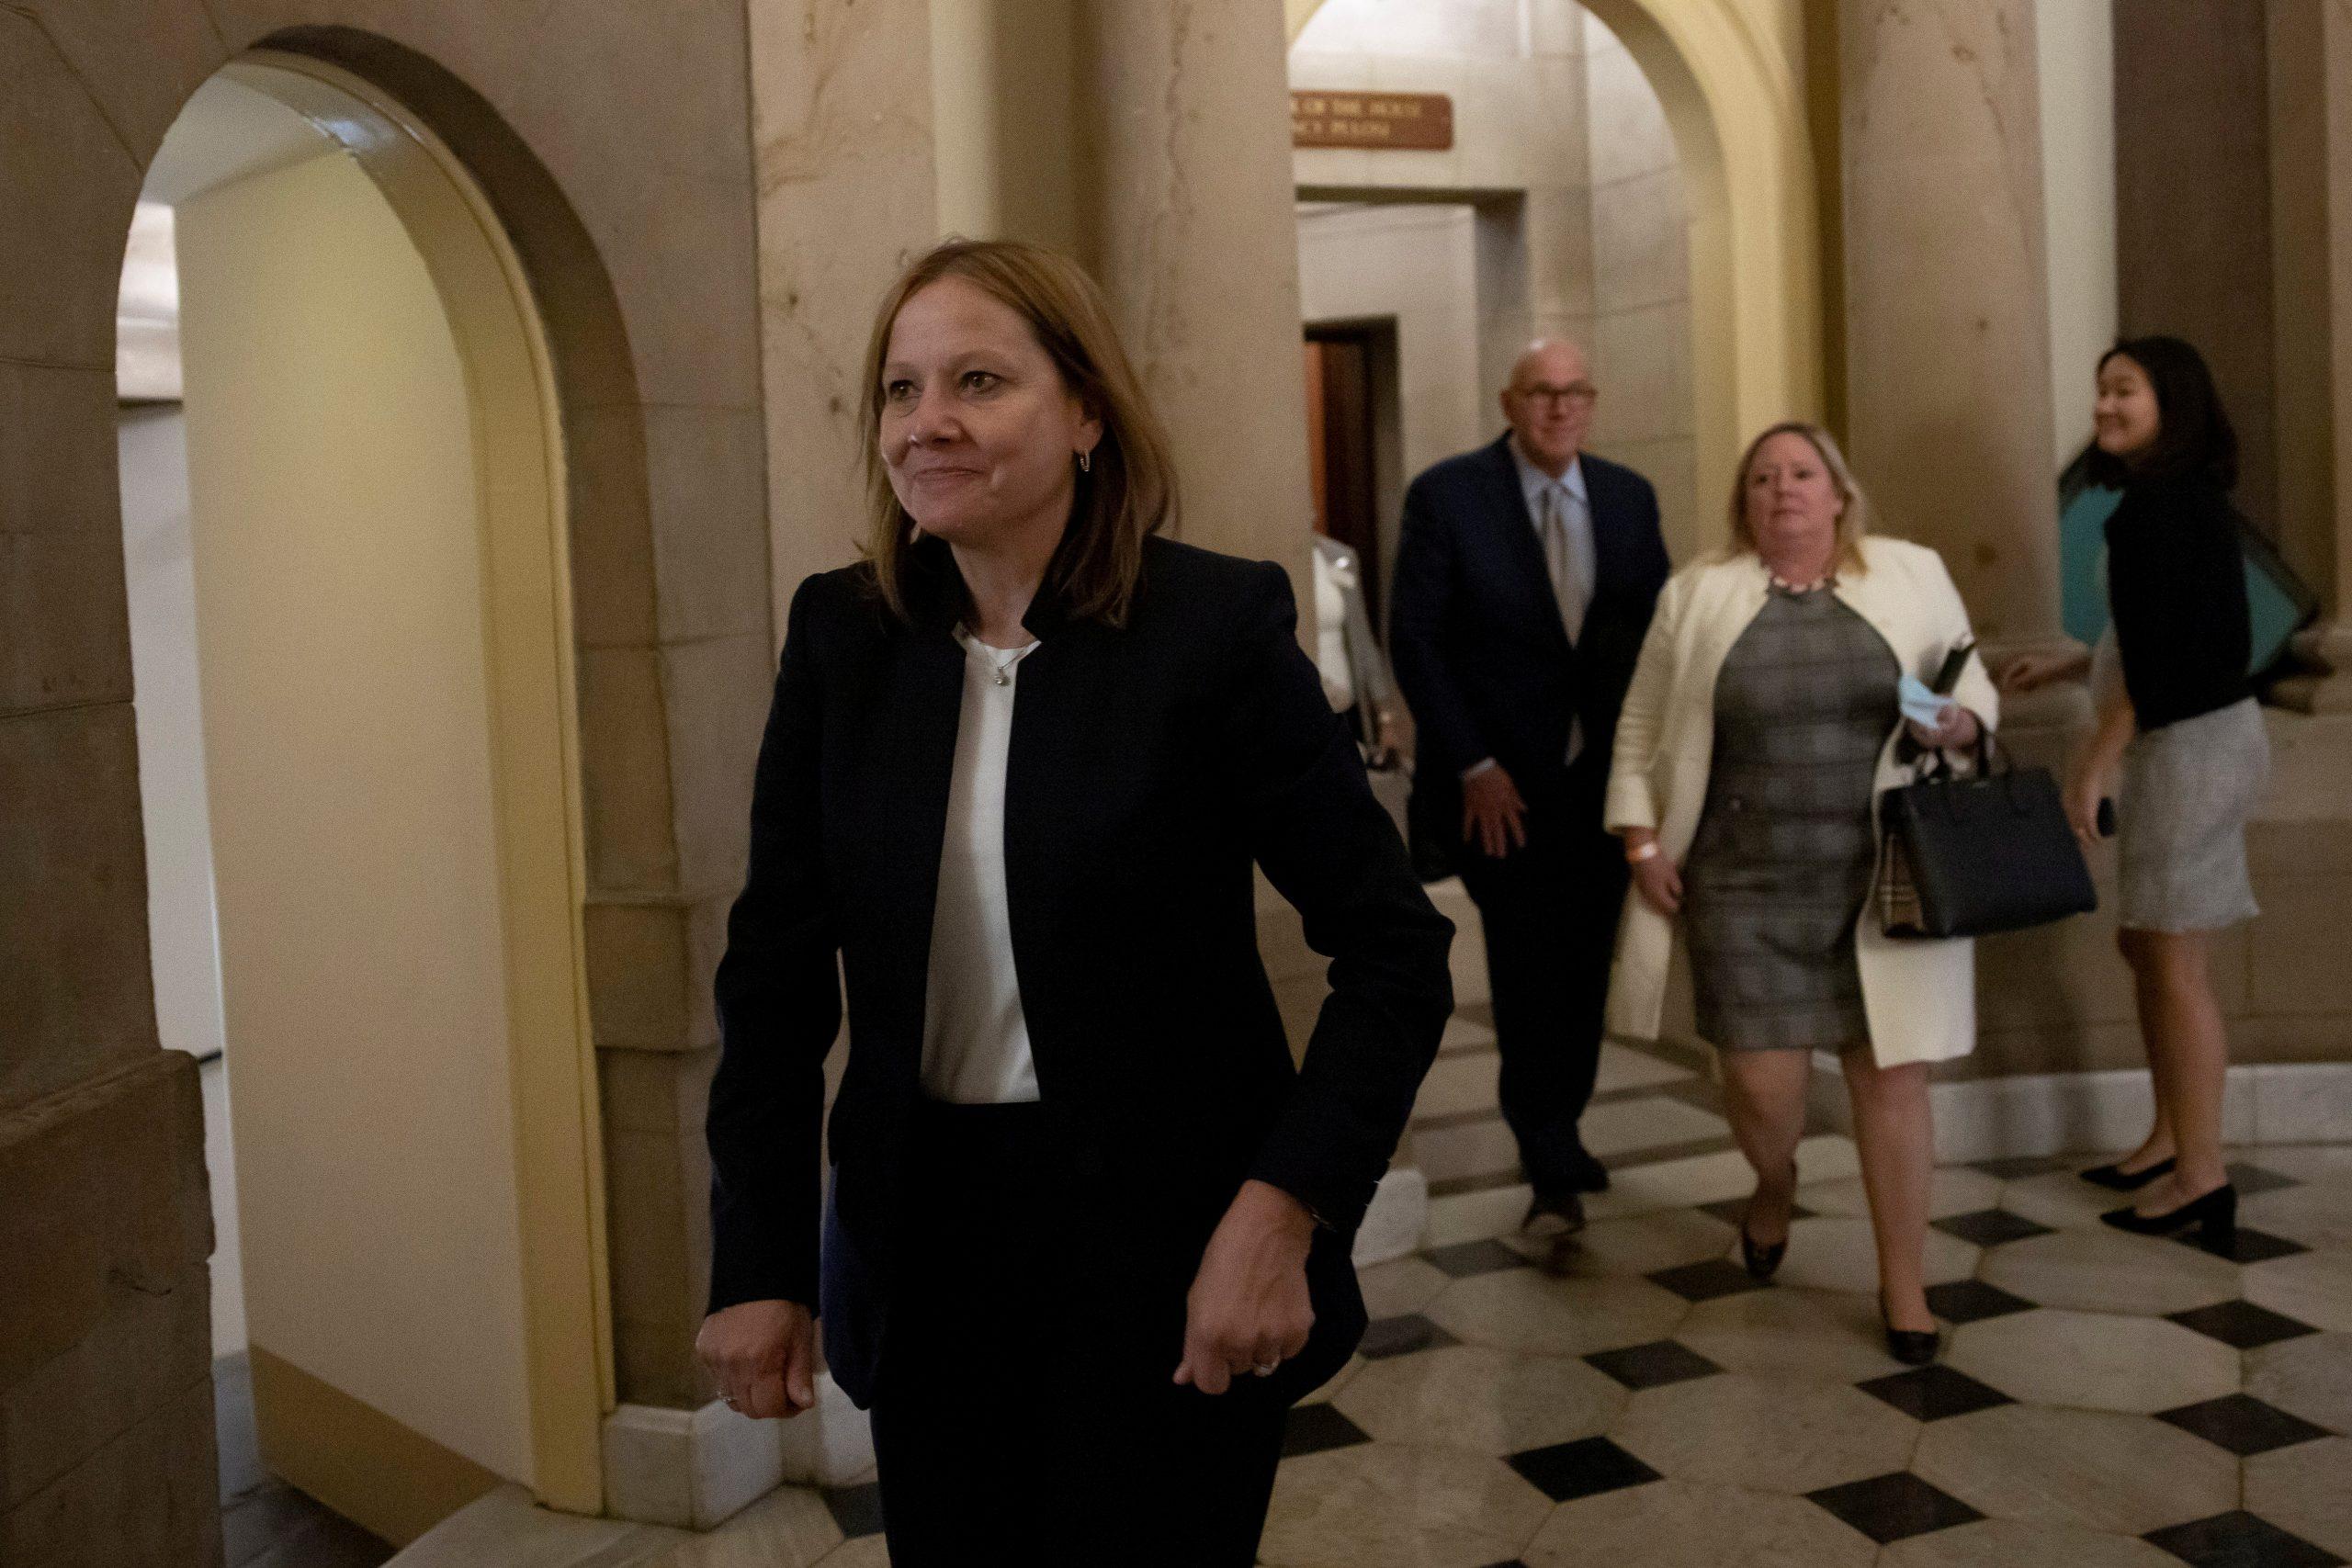 U.S. lawmakers press GM CEO on California emissions